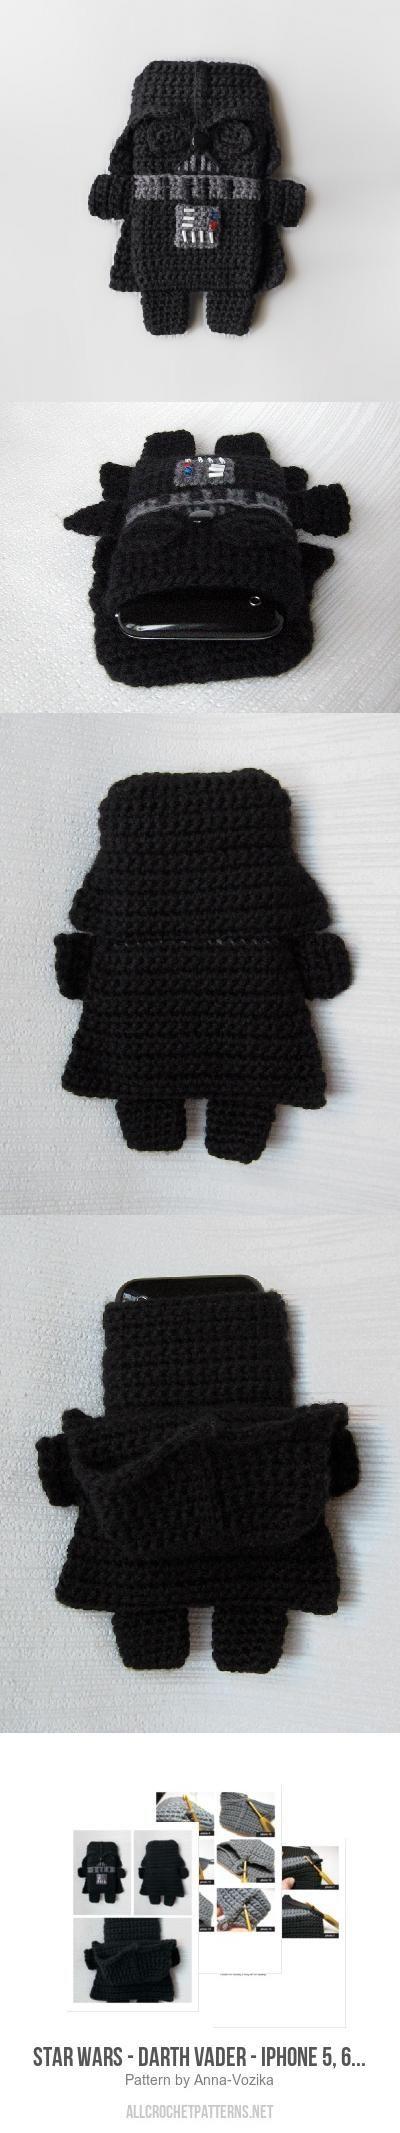 Star Wars - Darth Vader - iPhone 5, 6, 7 case crochet pattern